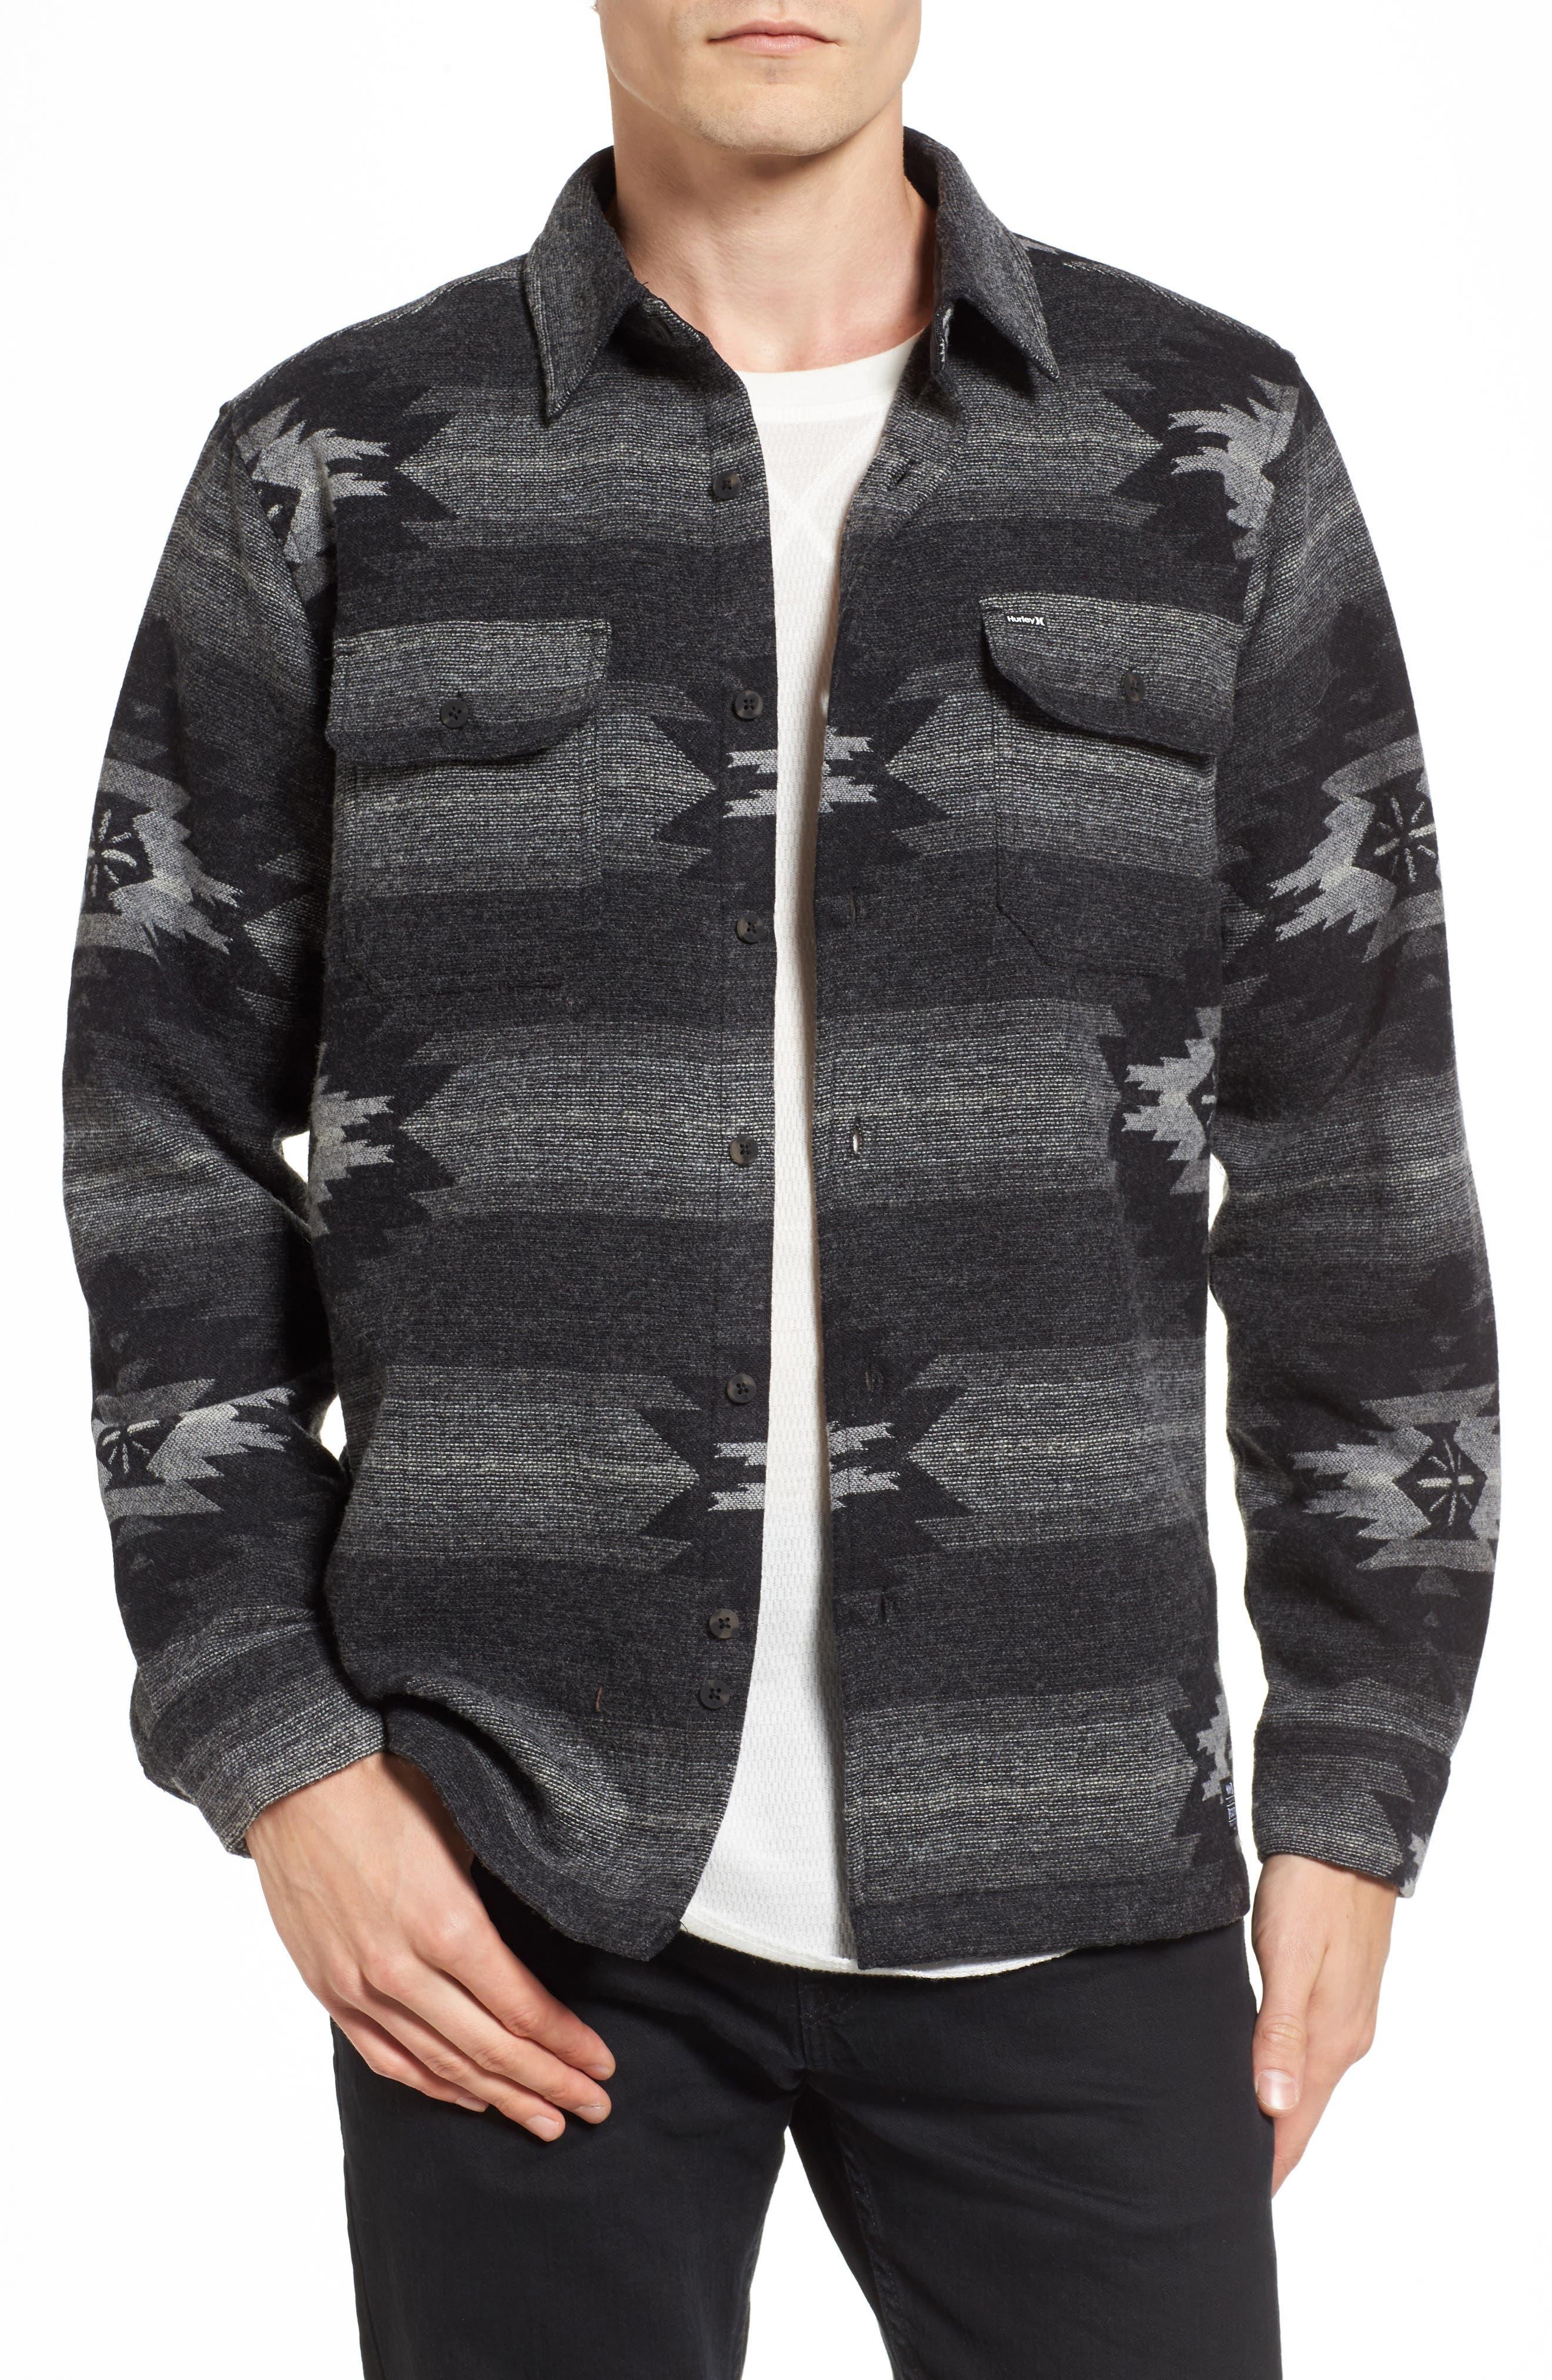 Hurley x Pendleton Flannel Shirt